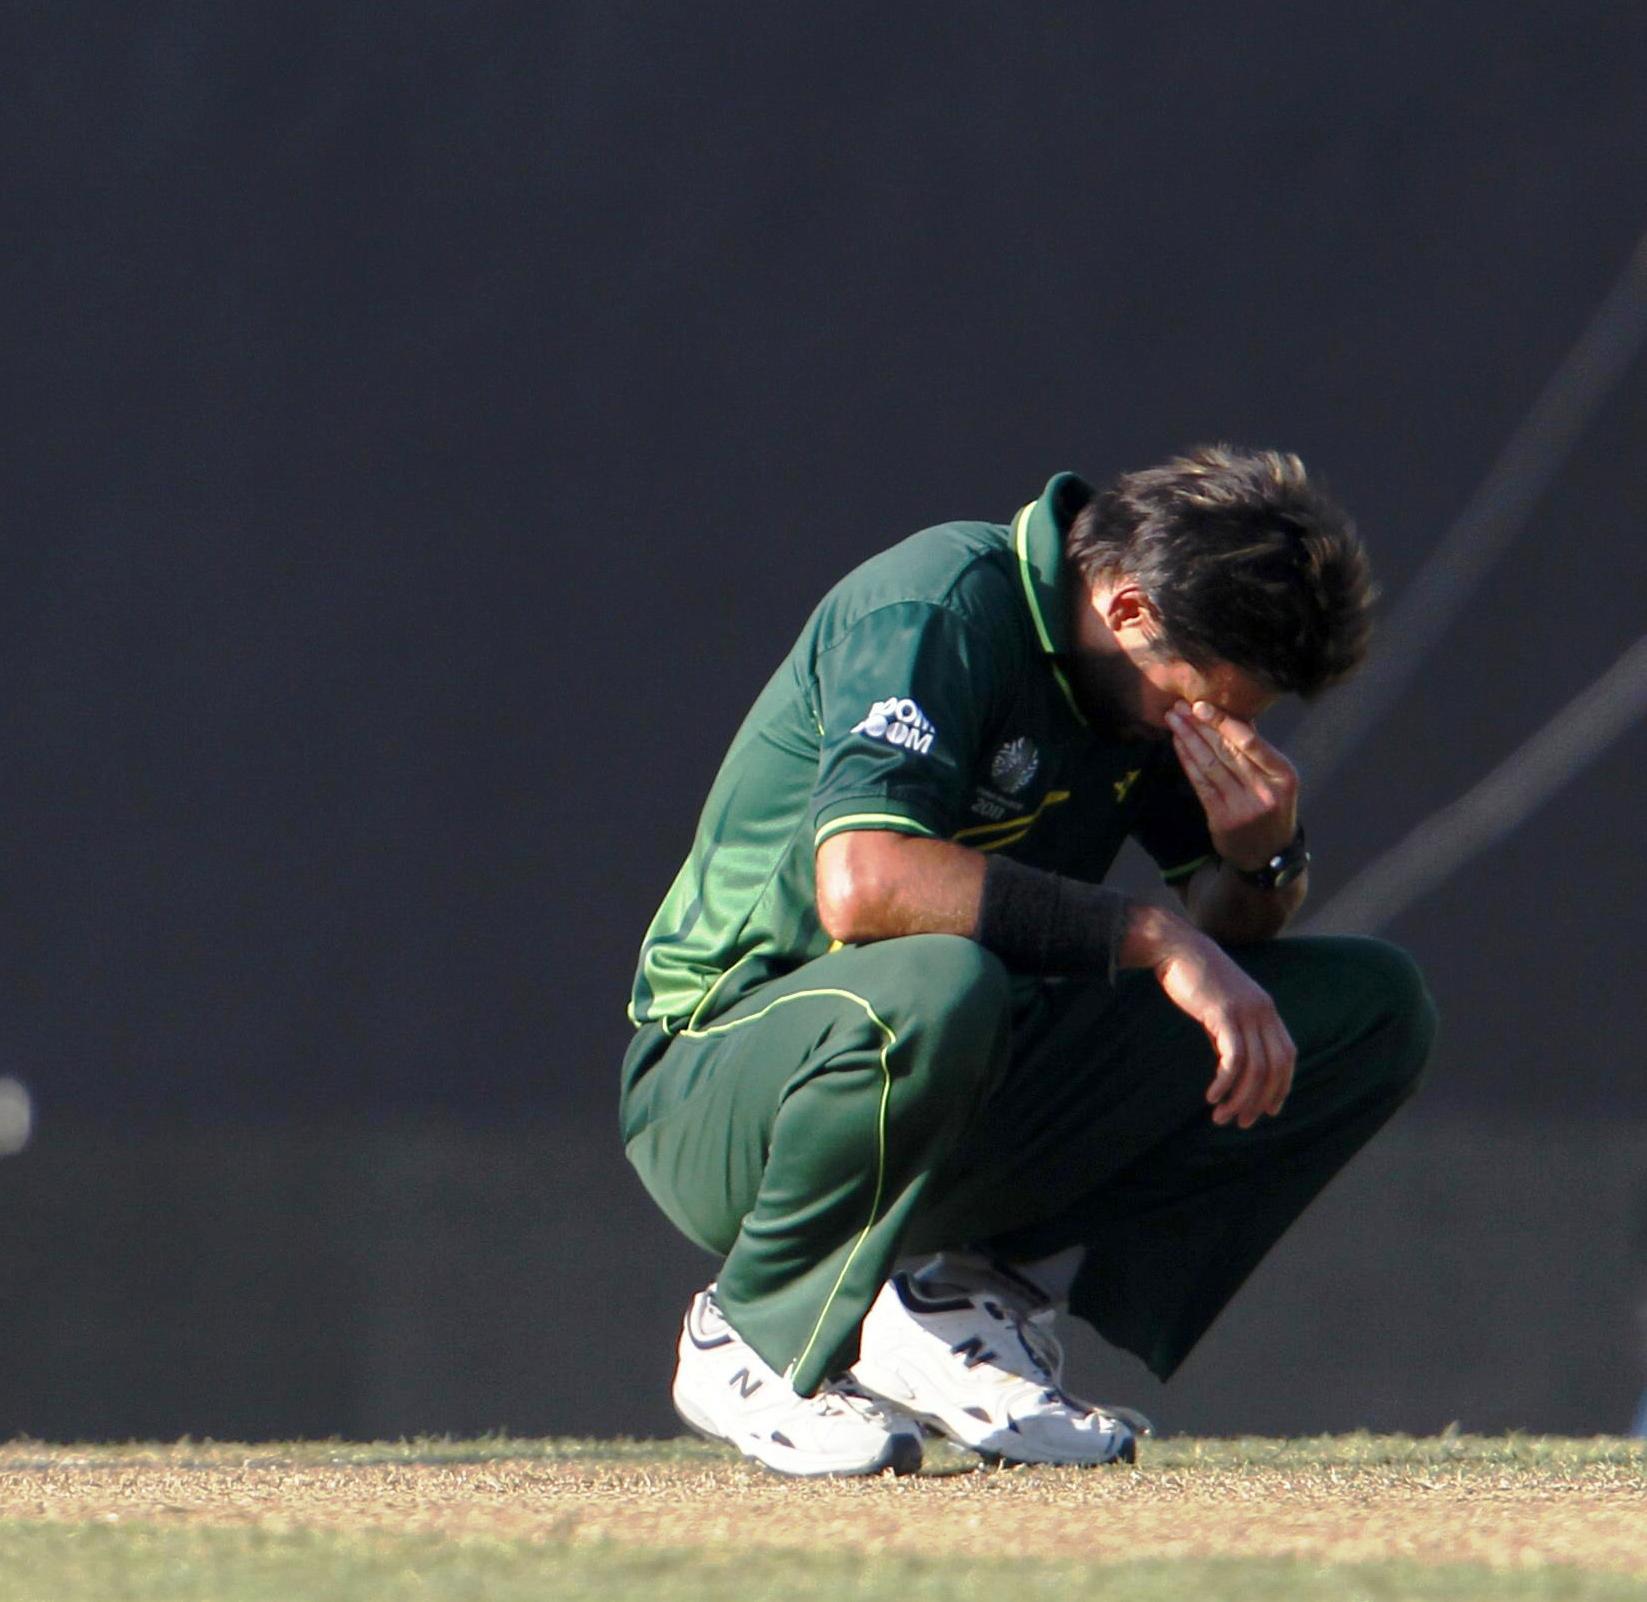 not sure how pakistan will use afridi after relinquishing captaincy says sangakkara